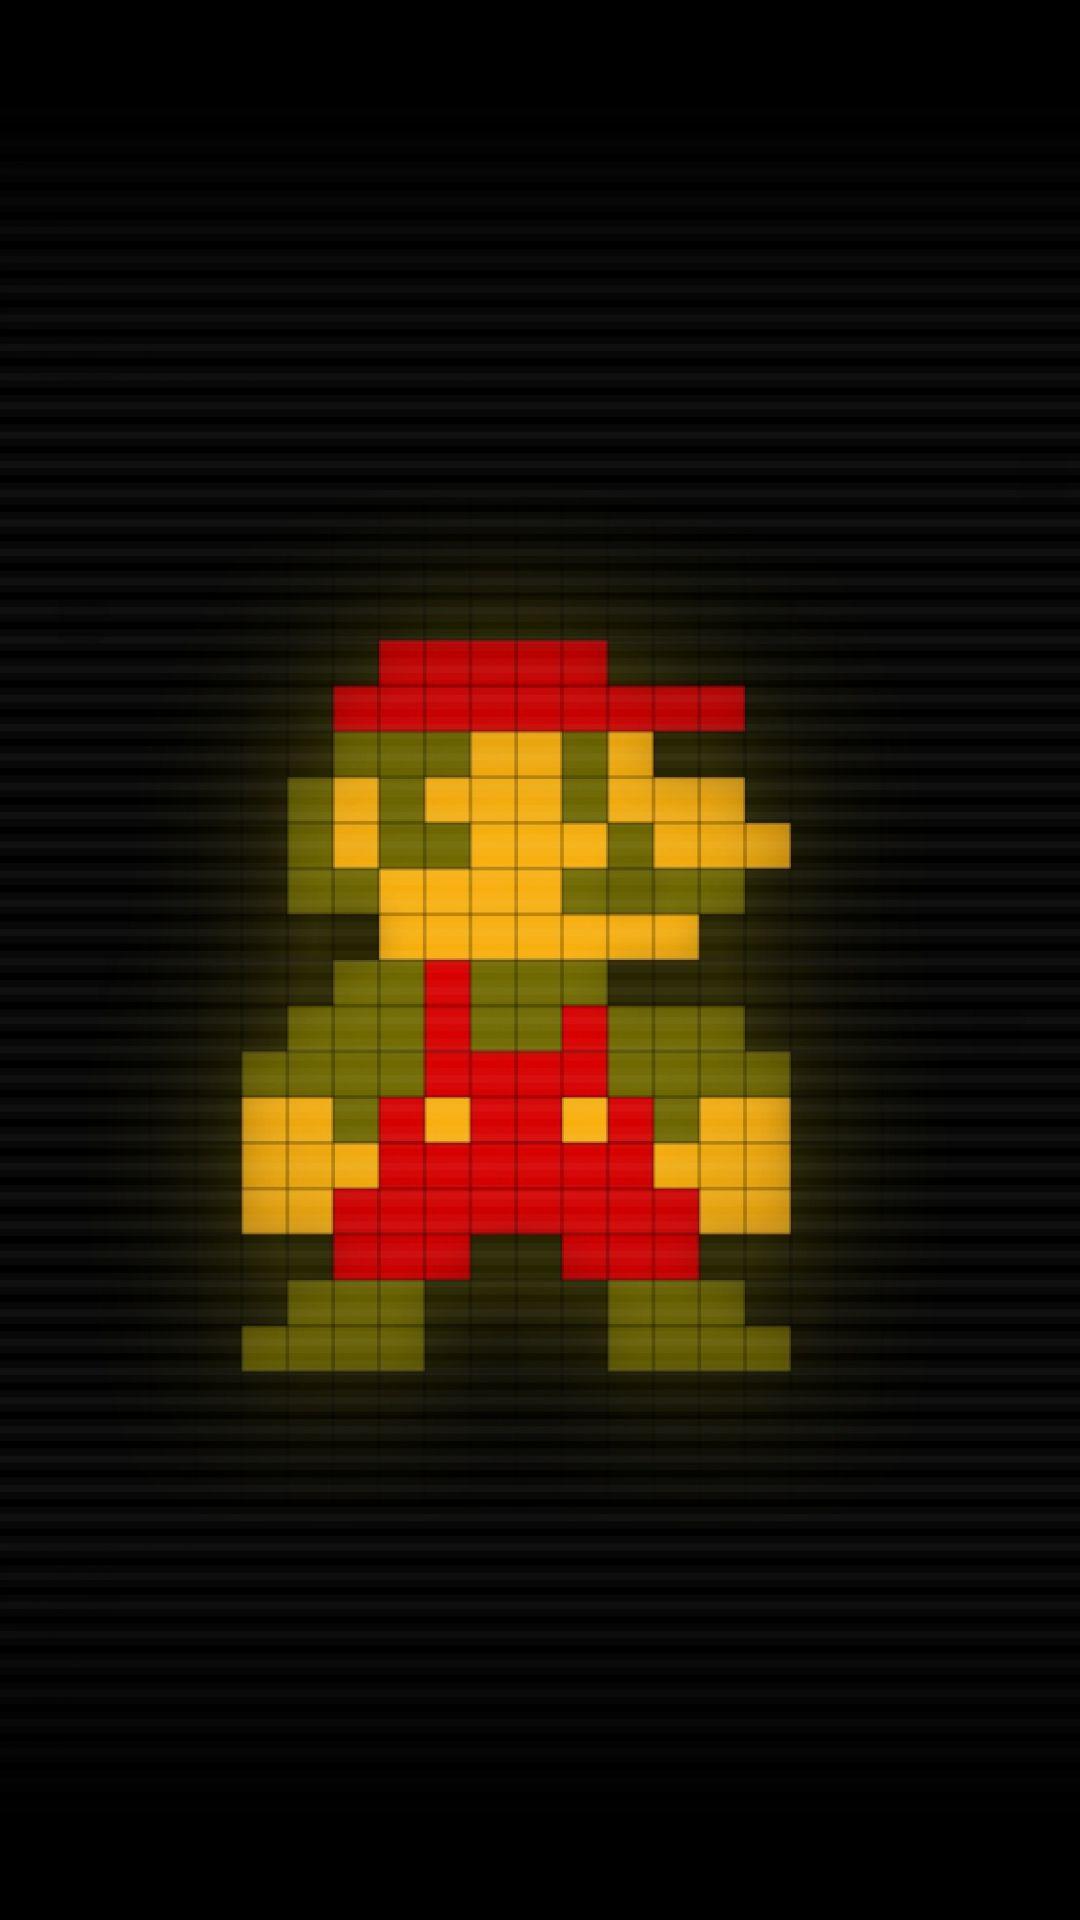 Hd Pixel Art Super Mario Bros Wallpaper For Mobile 1080x1920 Jpeg Image 1080 1920 Pixels Scaled 31 Character Wallpaper Mario Pixel Art